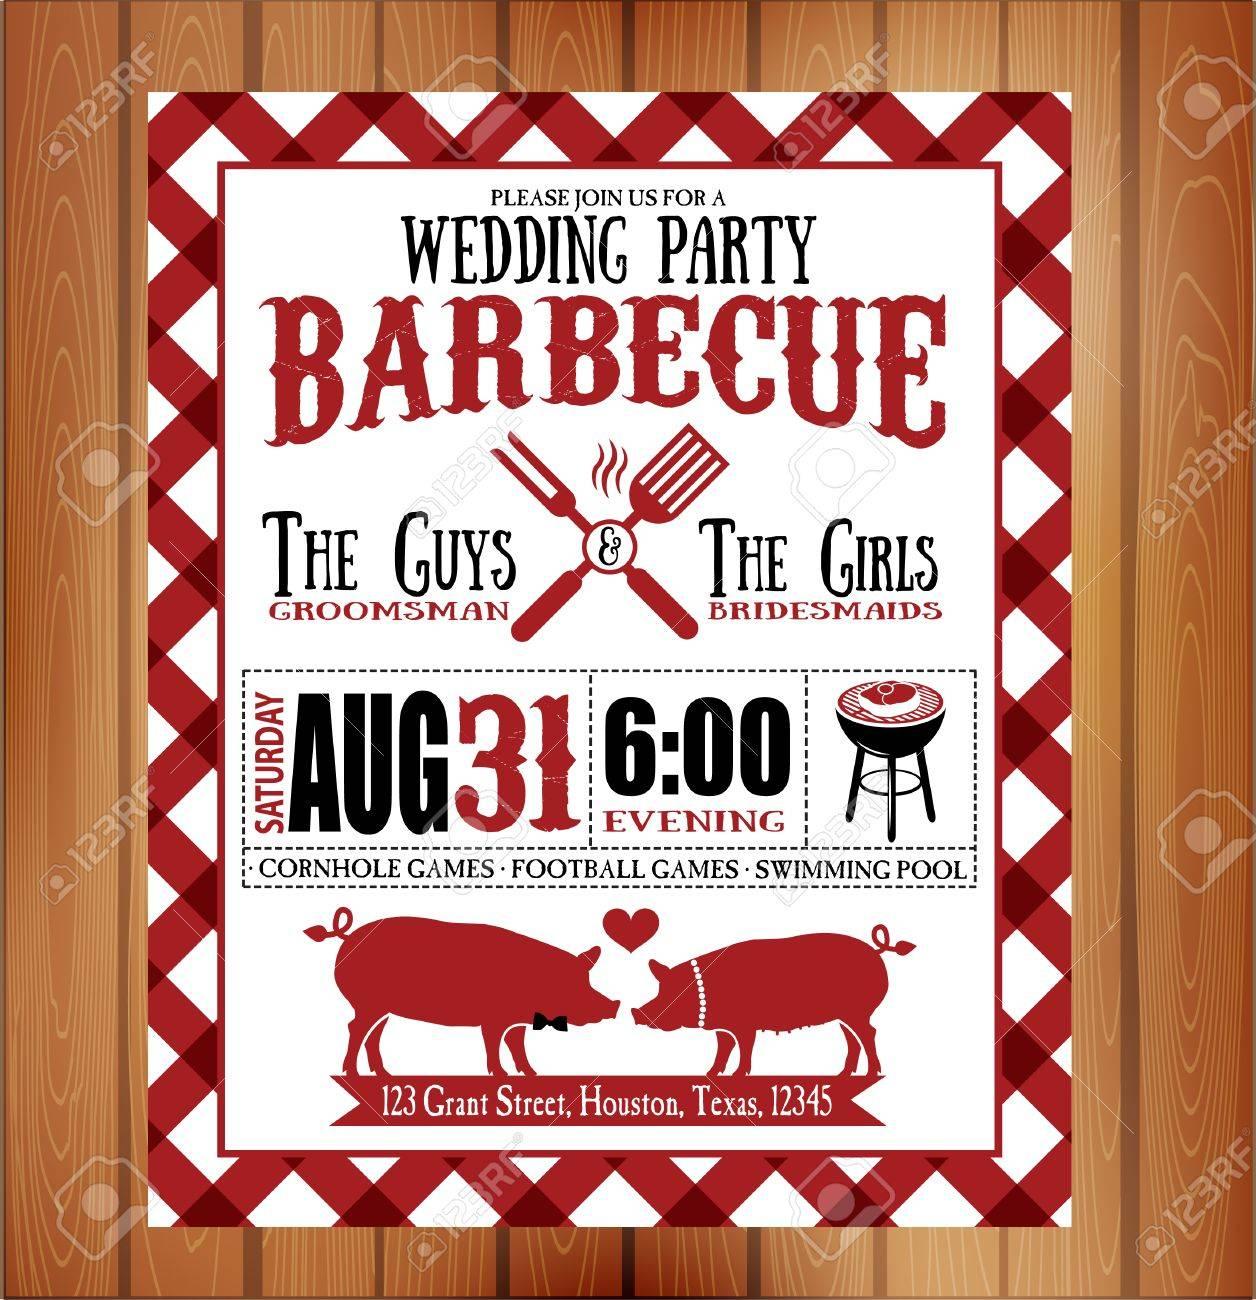 Vintage Barbecue Wedding Invitation Card Royalty Free Cliparts ...